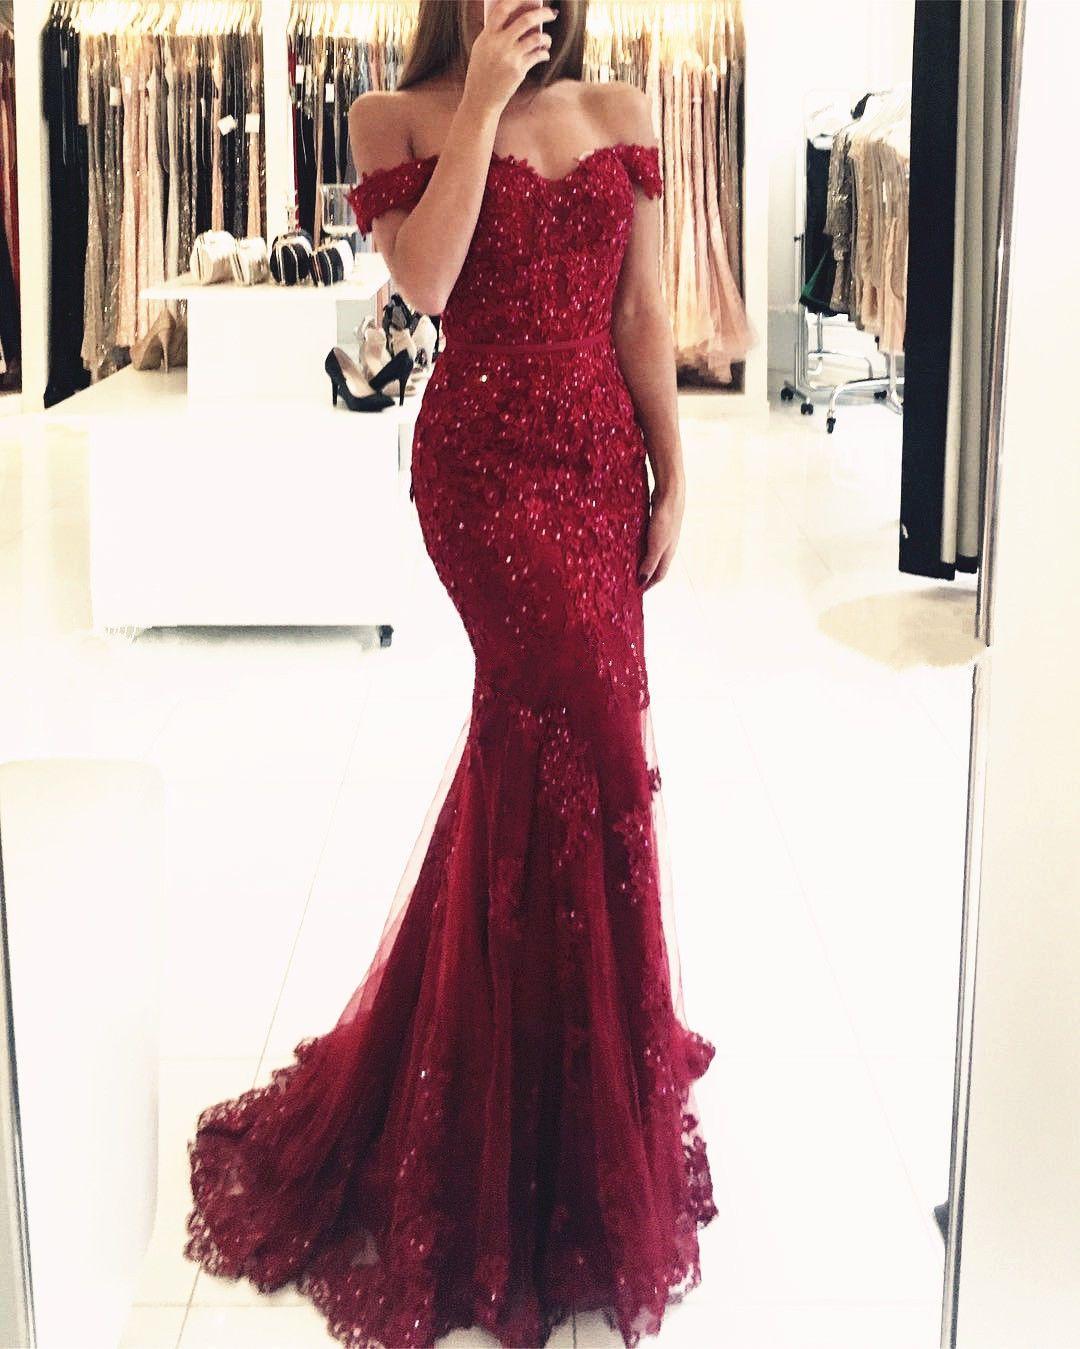 Awesome amazing custom crystal formal evening dress mermaid